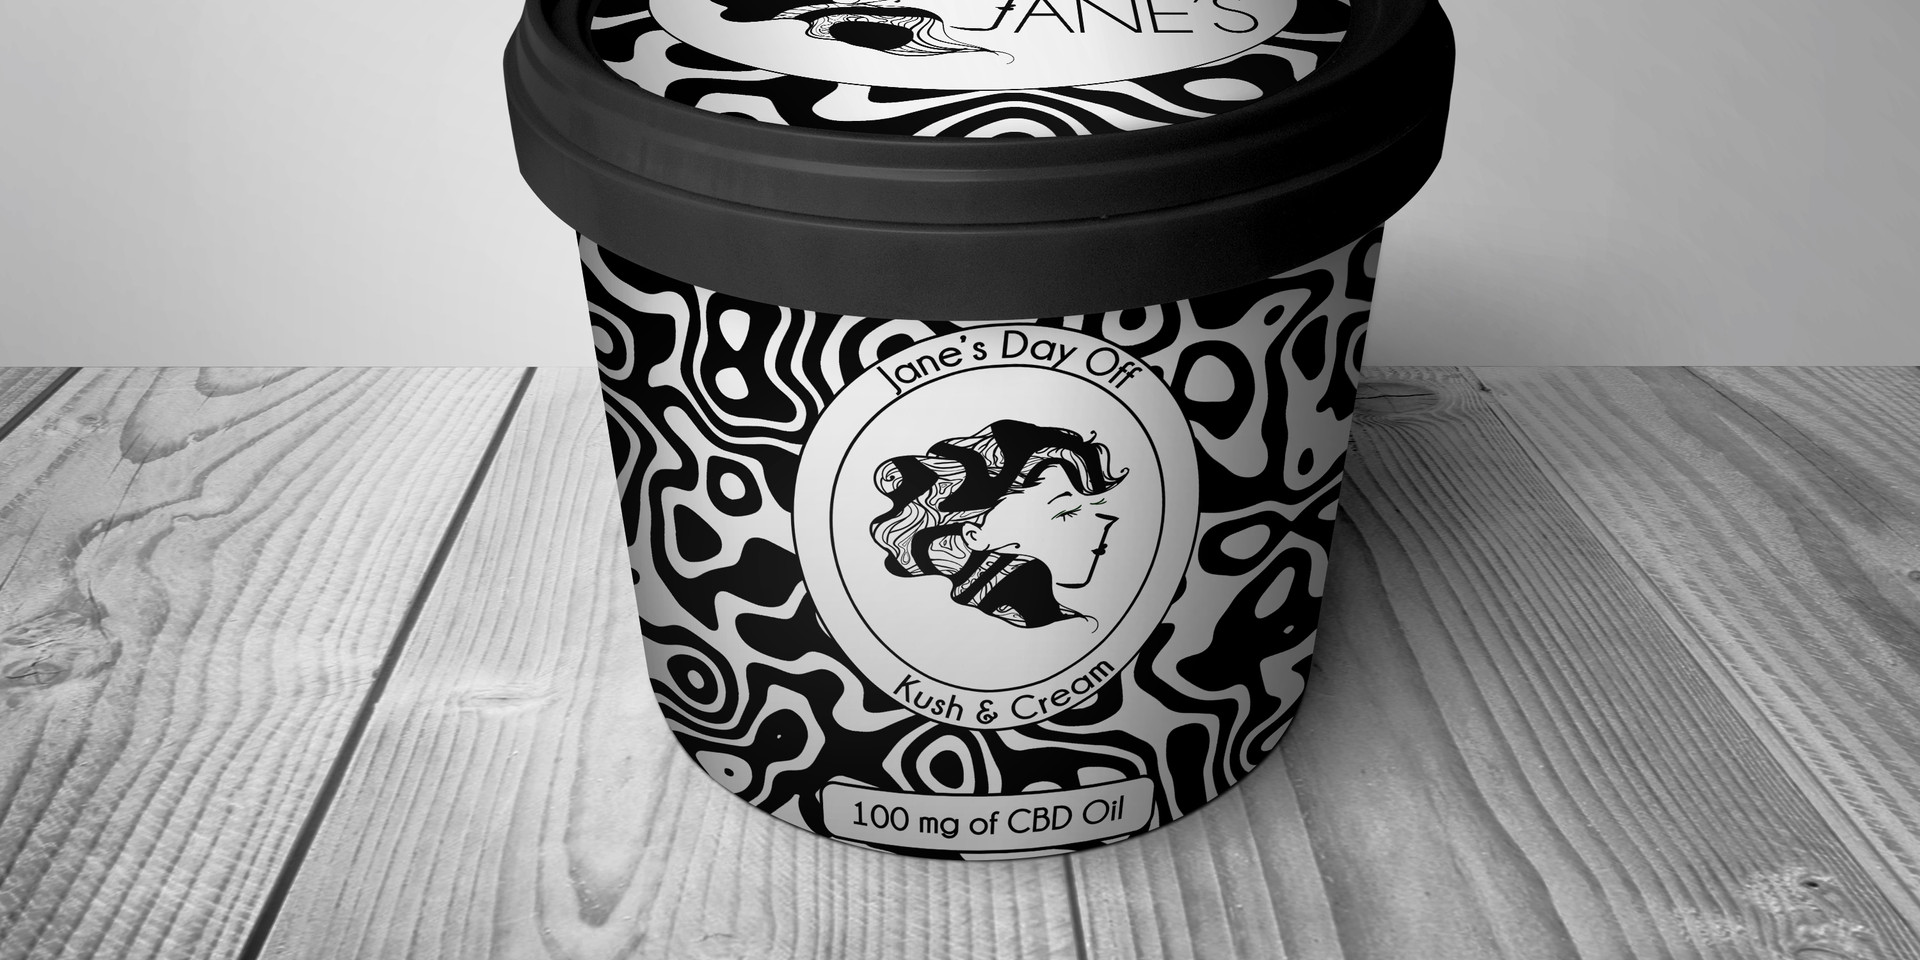 Kush & Cream Packaging Closed Eyes.jpg